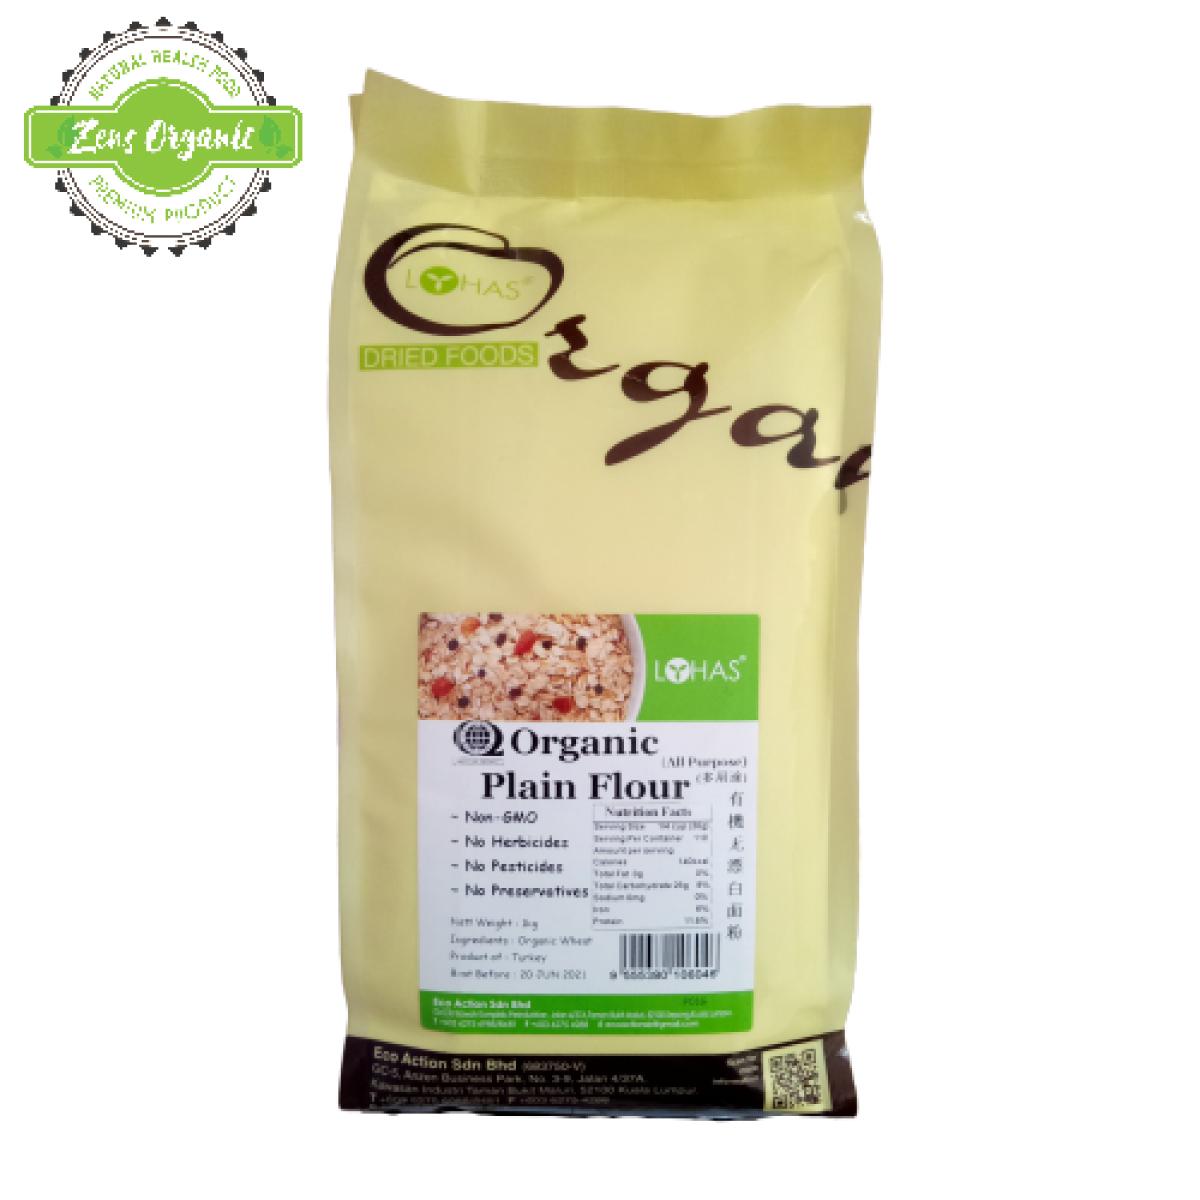 Lohas Organic Plain Flour (All Purpose) 1kg (Product of Turkey)